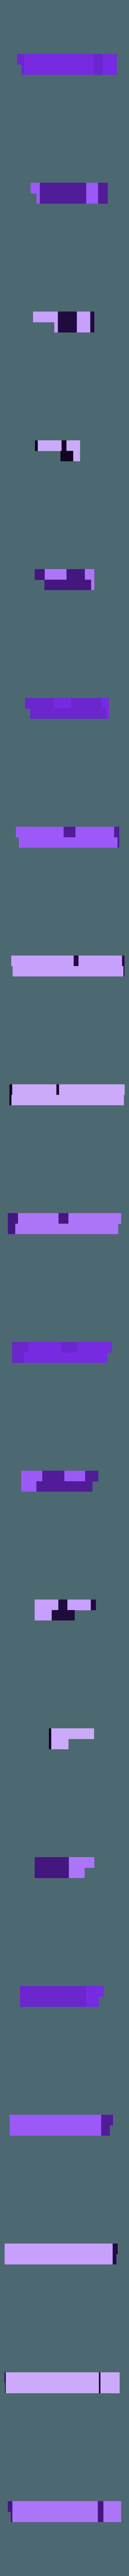 Pièce 11.STL Download STL file Translocator Sombra • 3D print model, Midnight_05